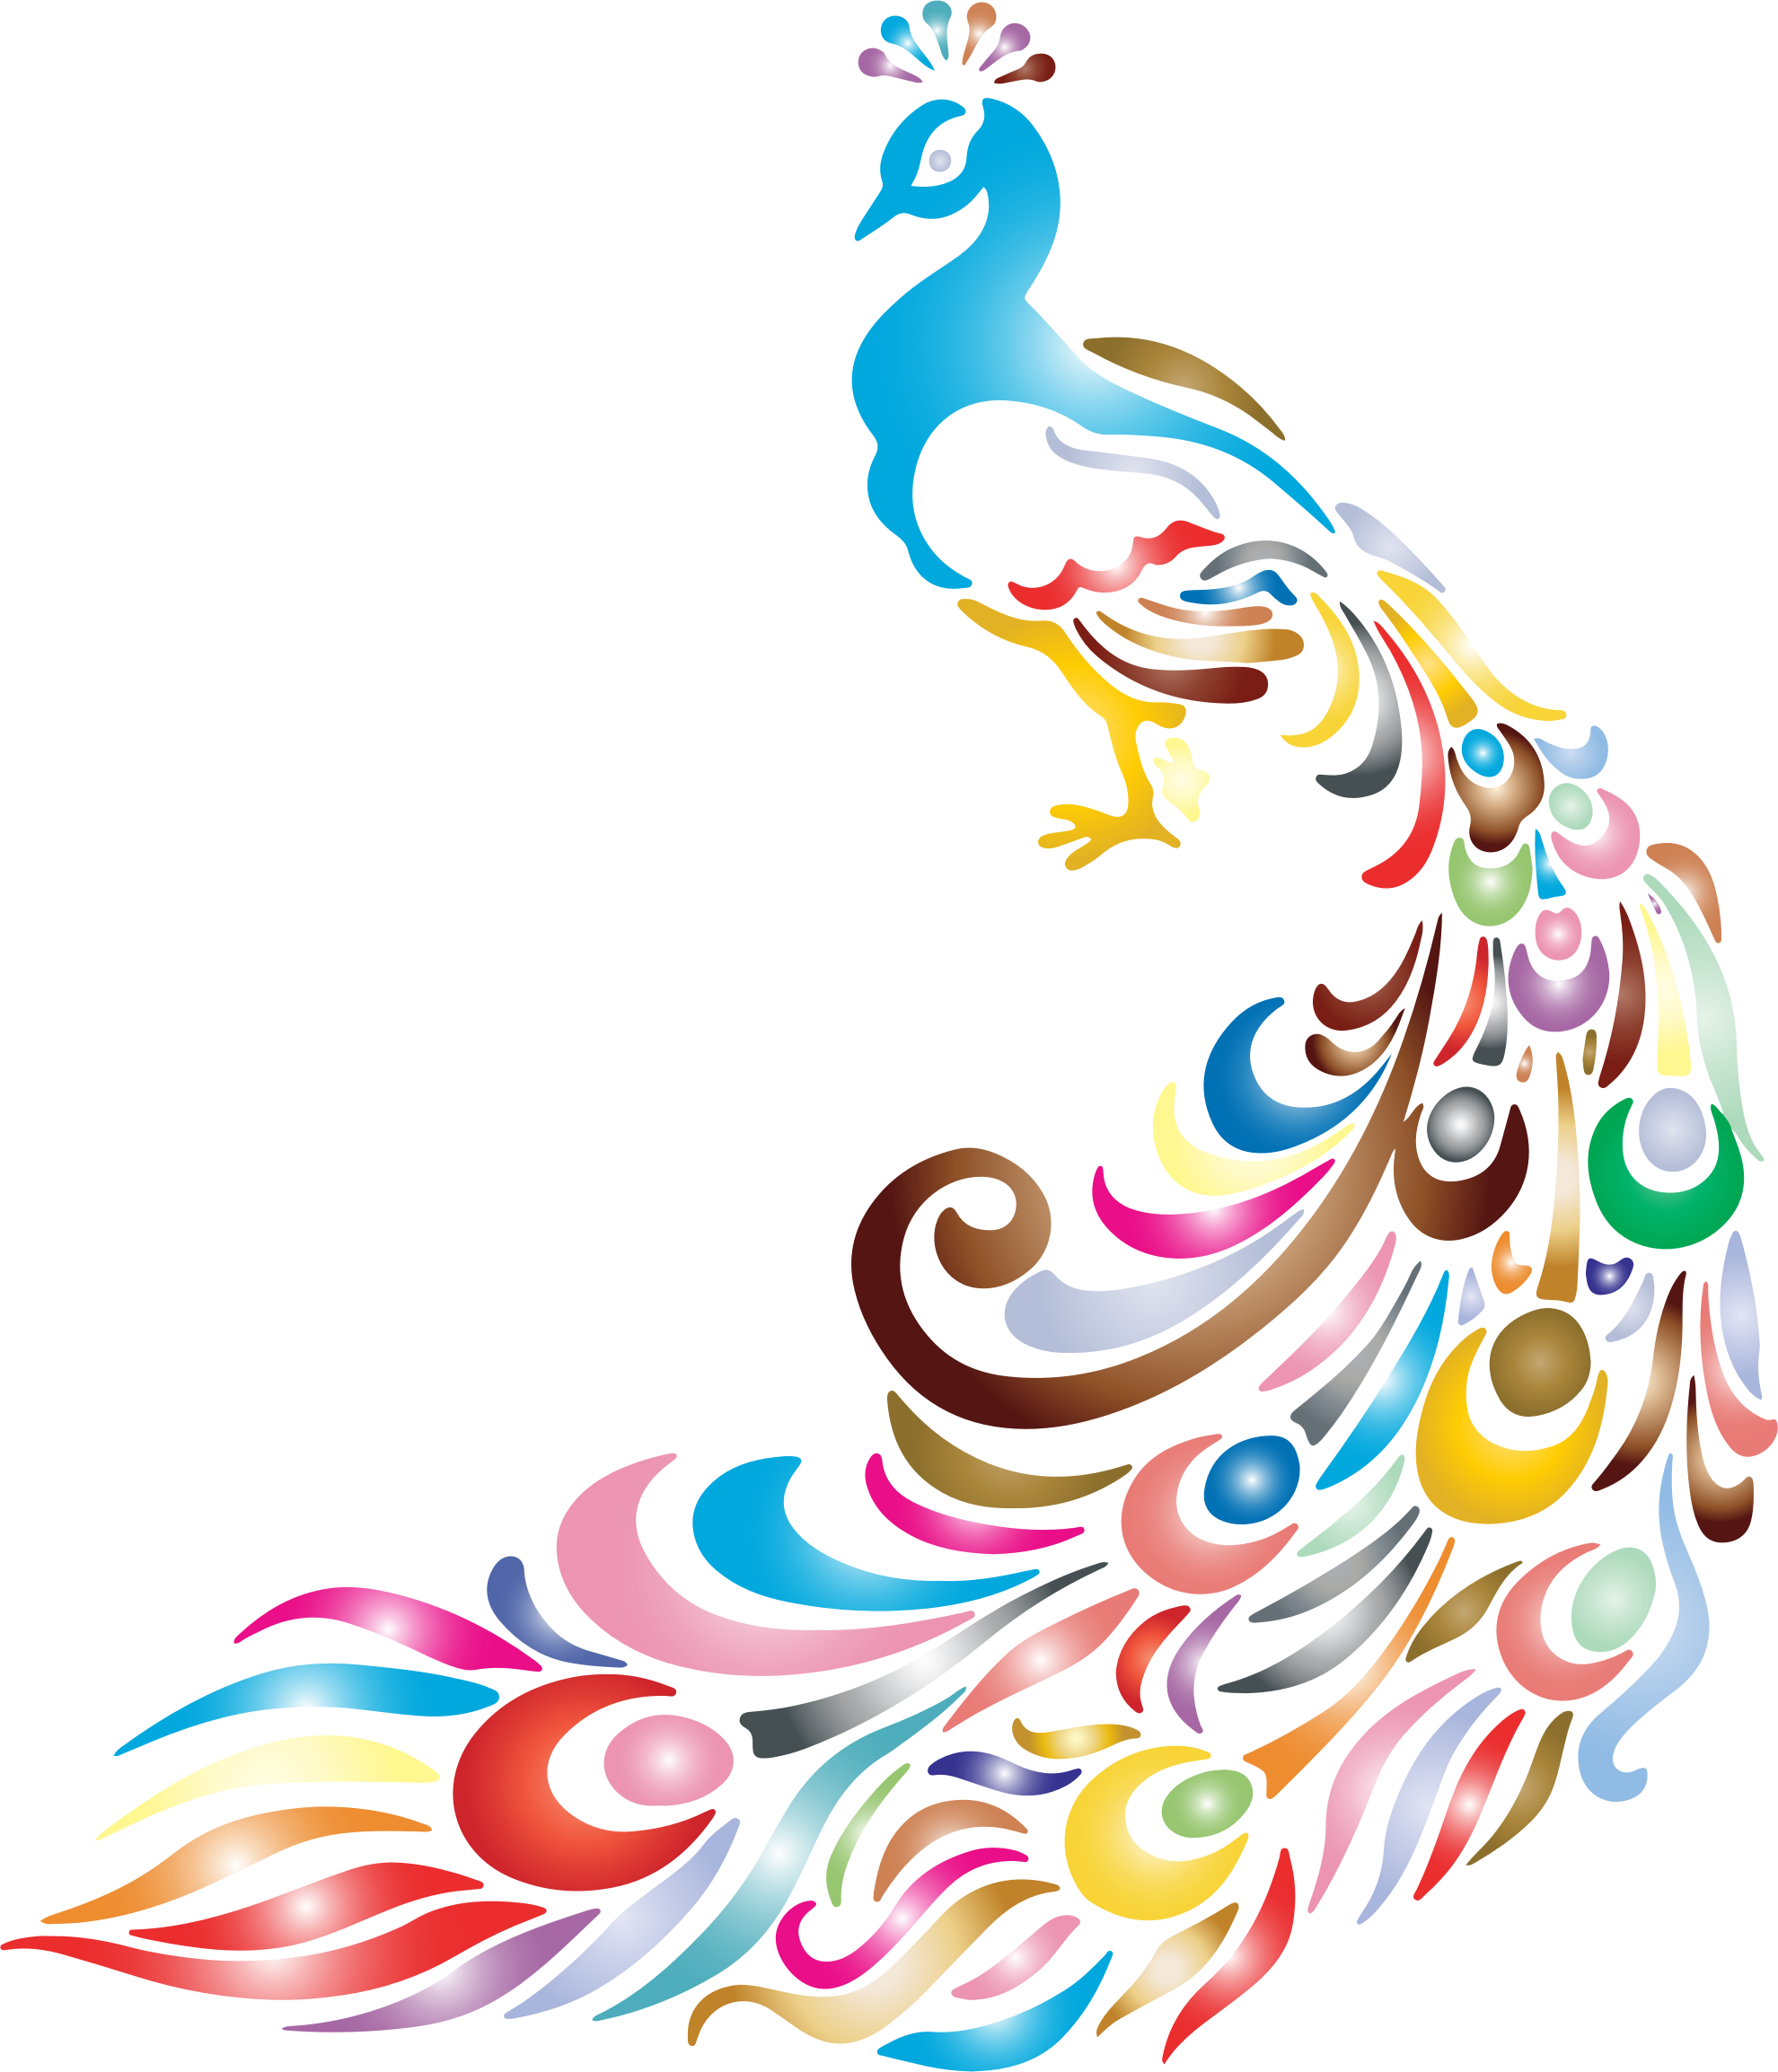 Party . Peacock clipart rainbow